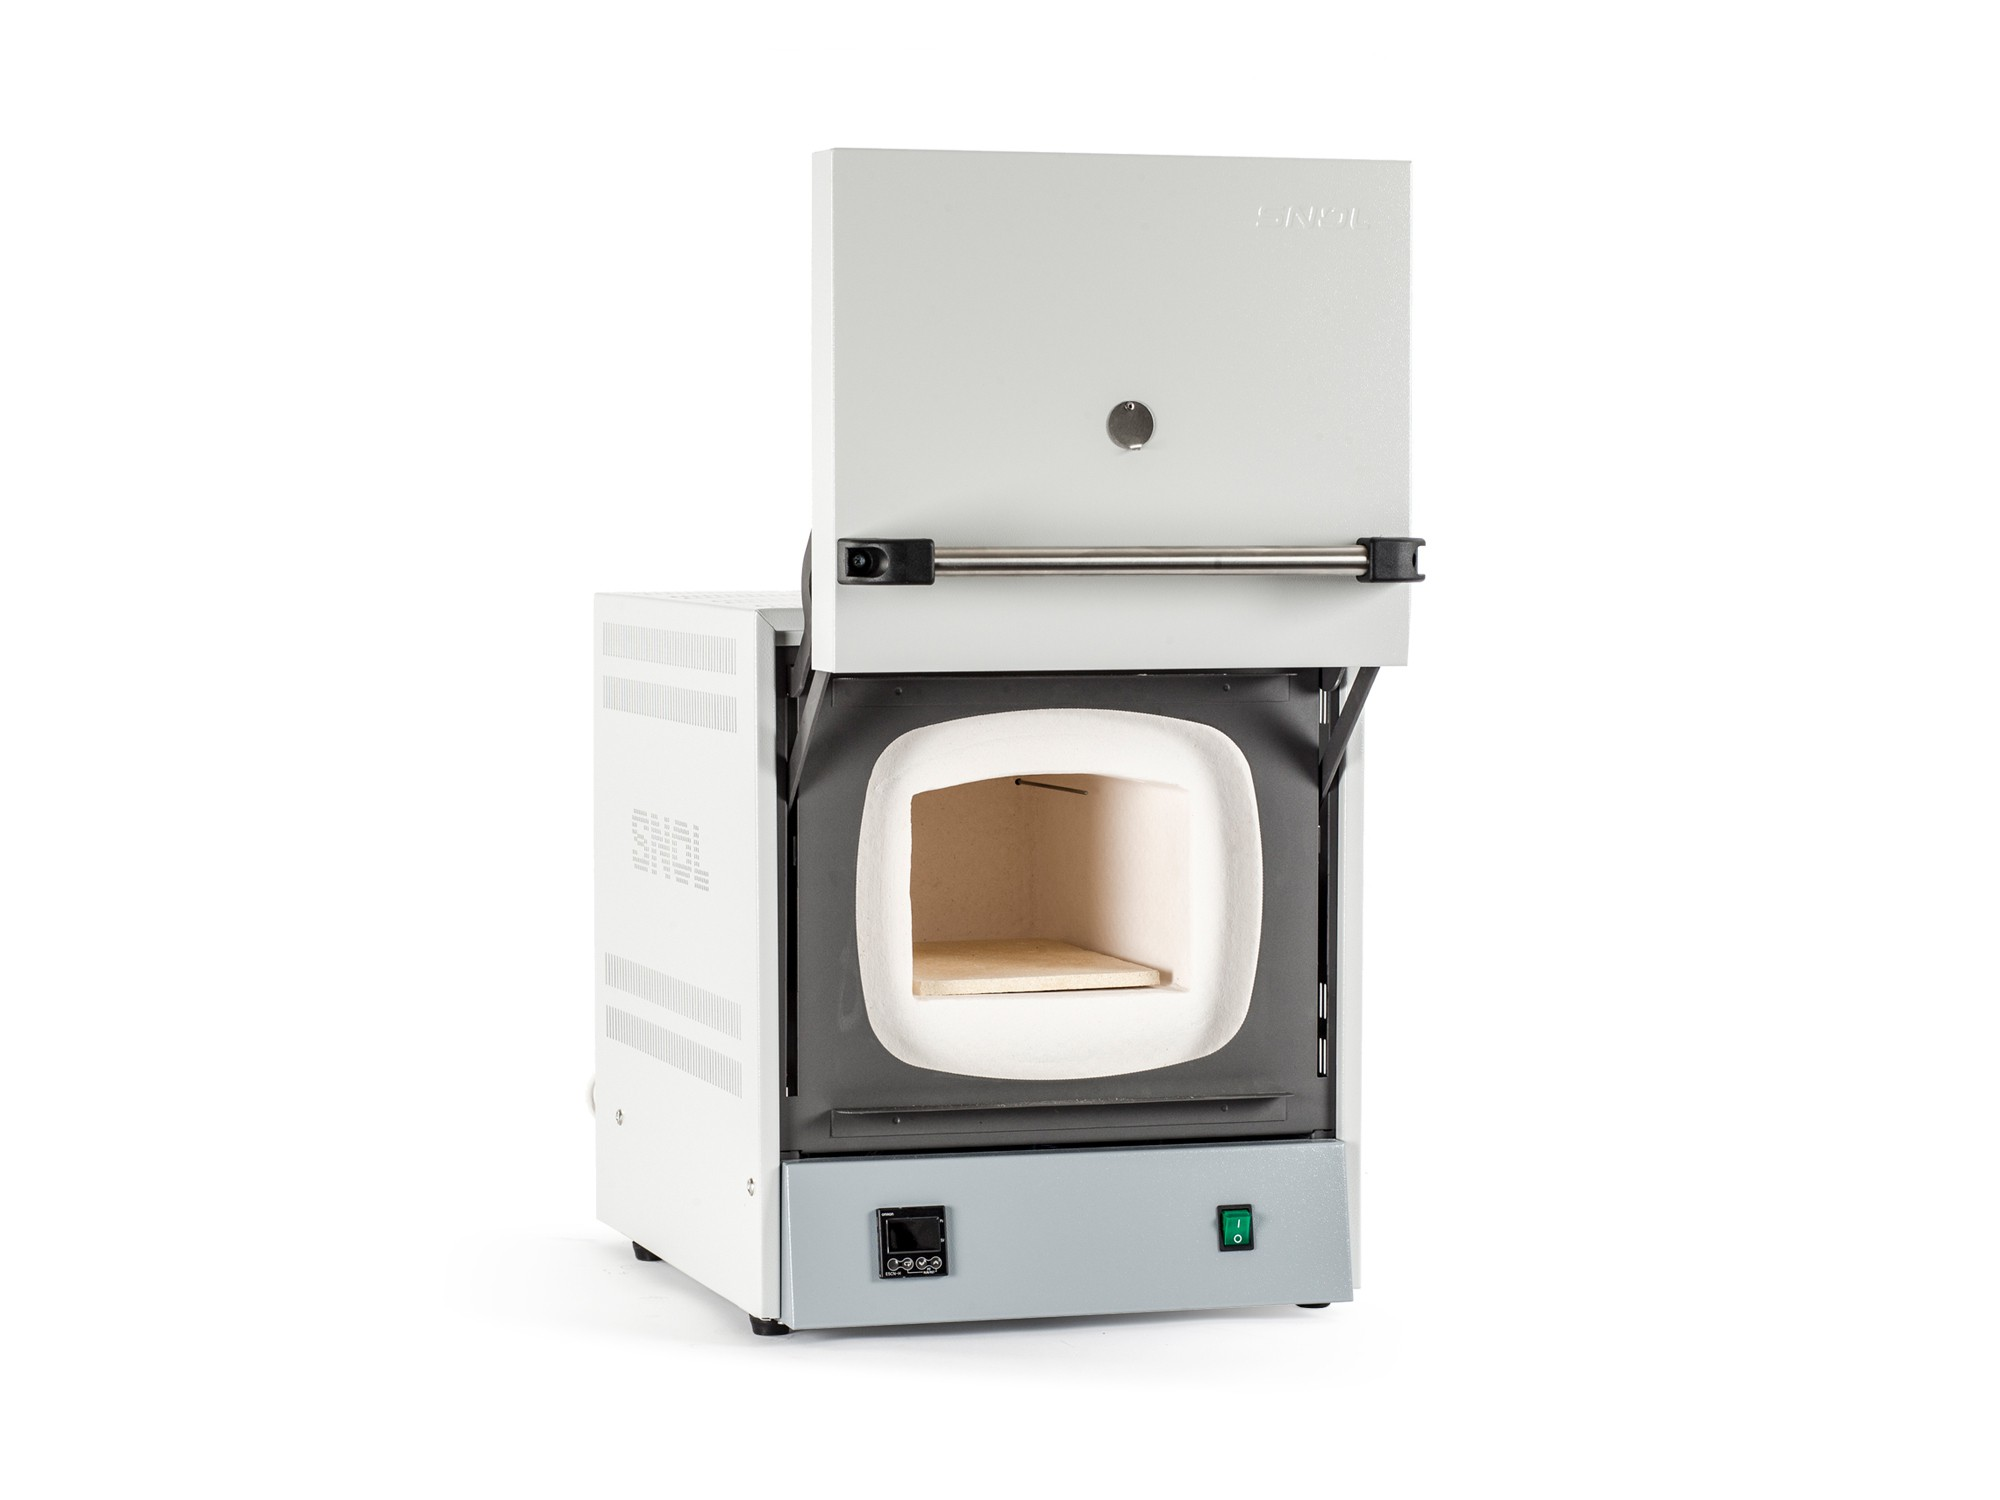 Lò nung muffle furnace 8,2/1100 LHM01 Snol